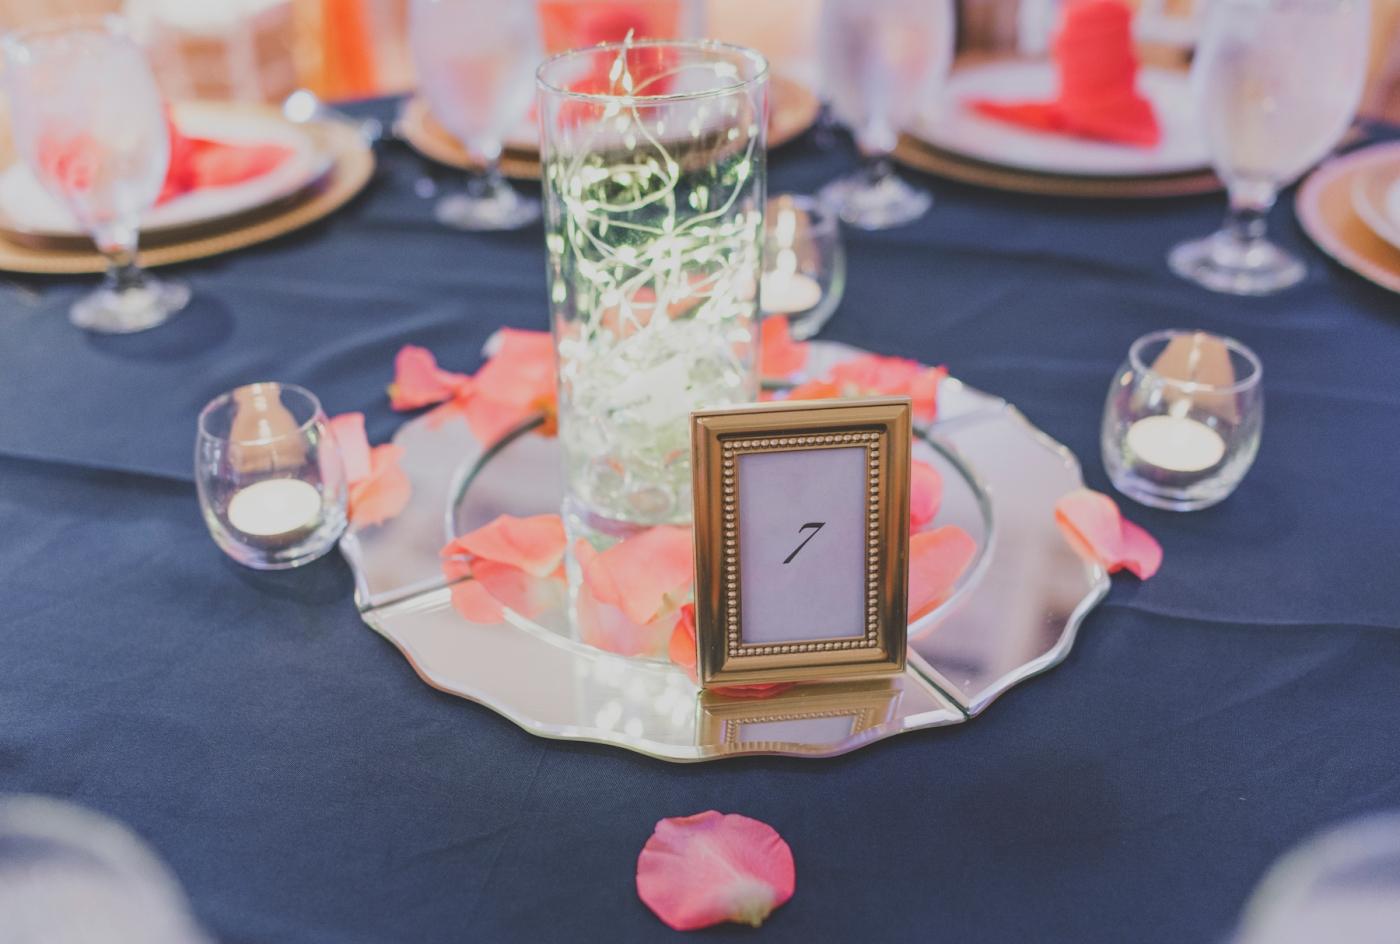 DSC_3067Everett_Wedding_Ballroom_Jane_Speleers_photography_Rachel_and_Edmund_cake cutting_2017